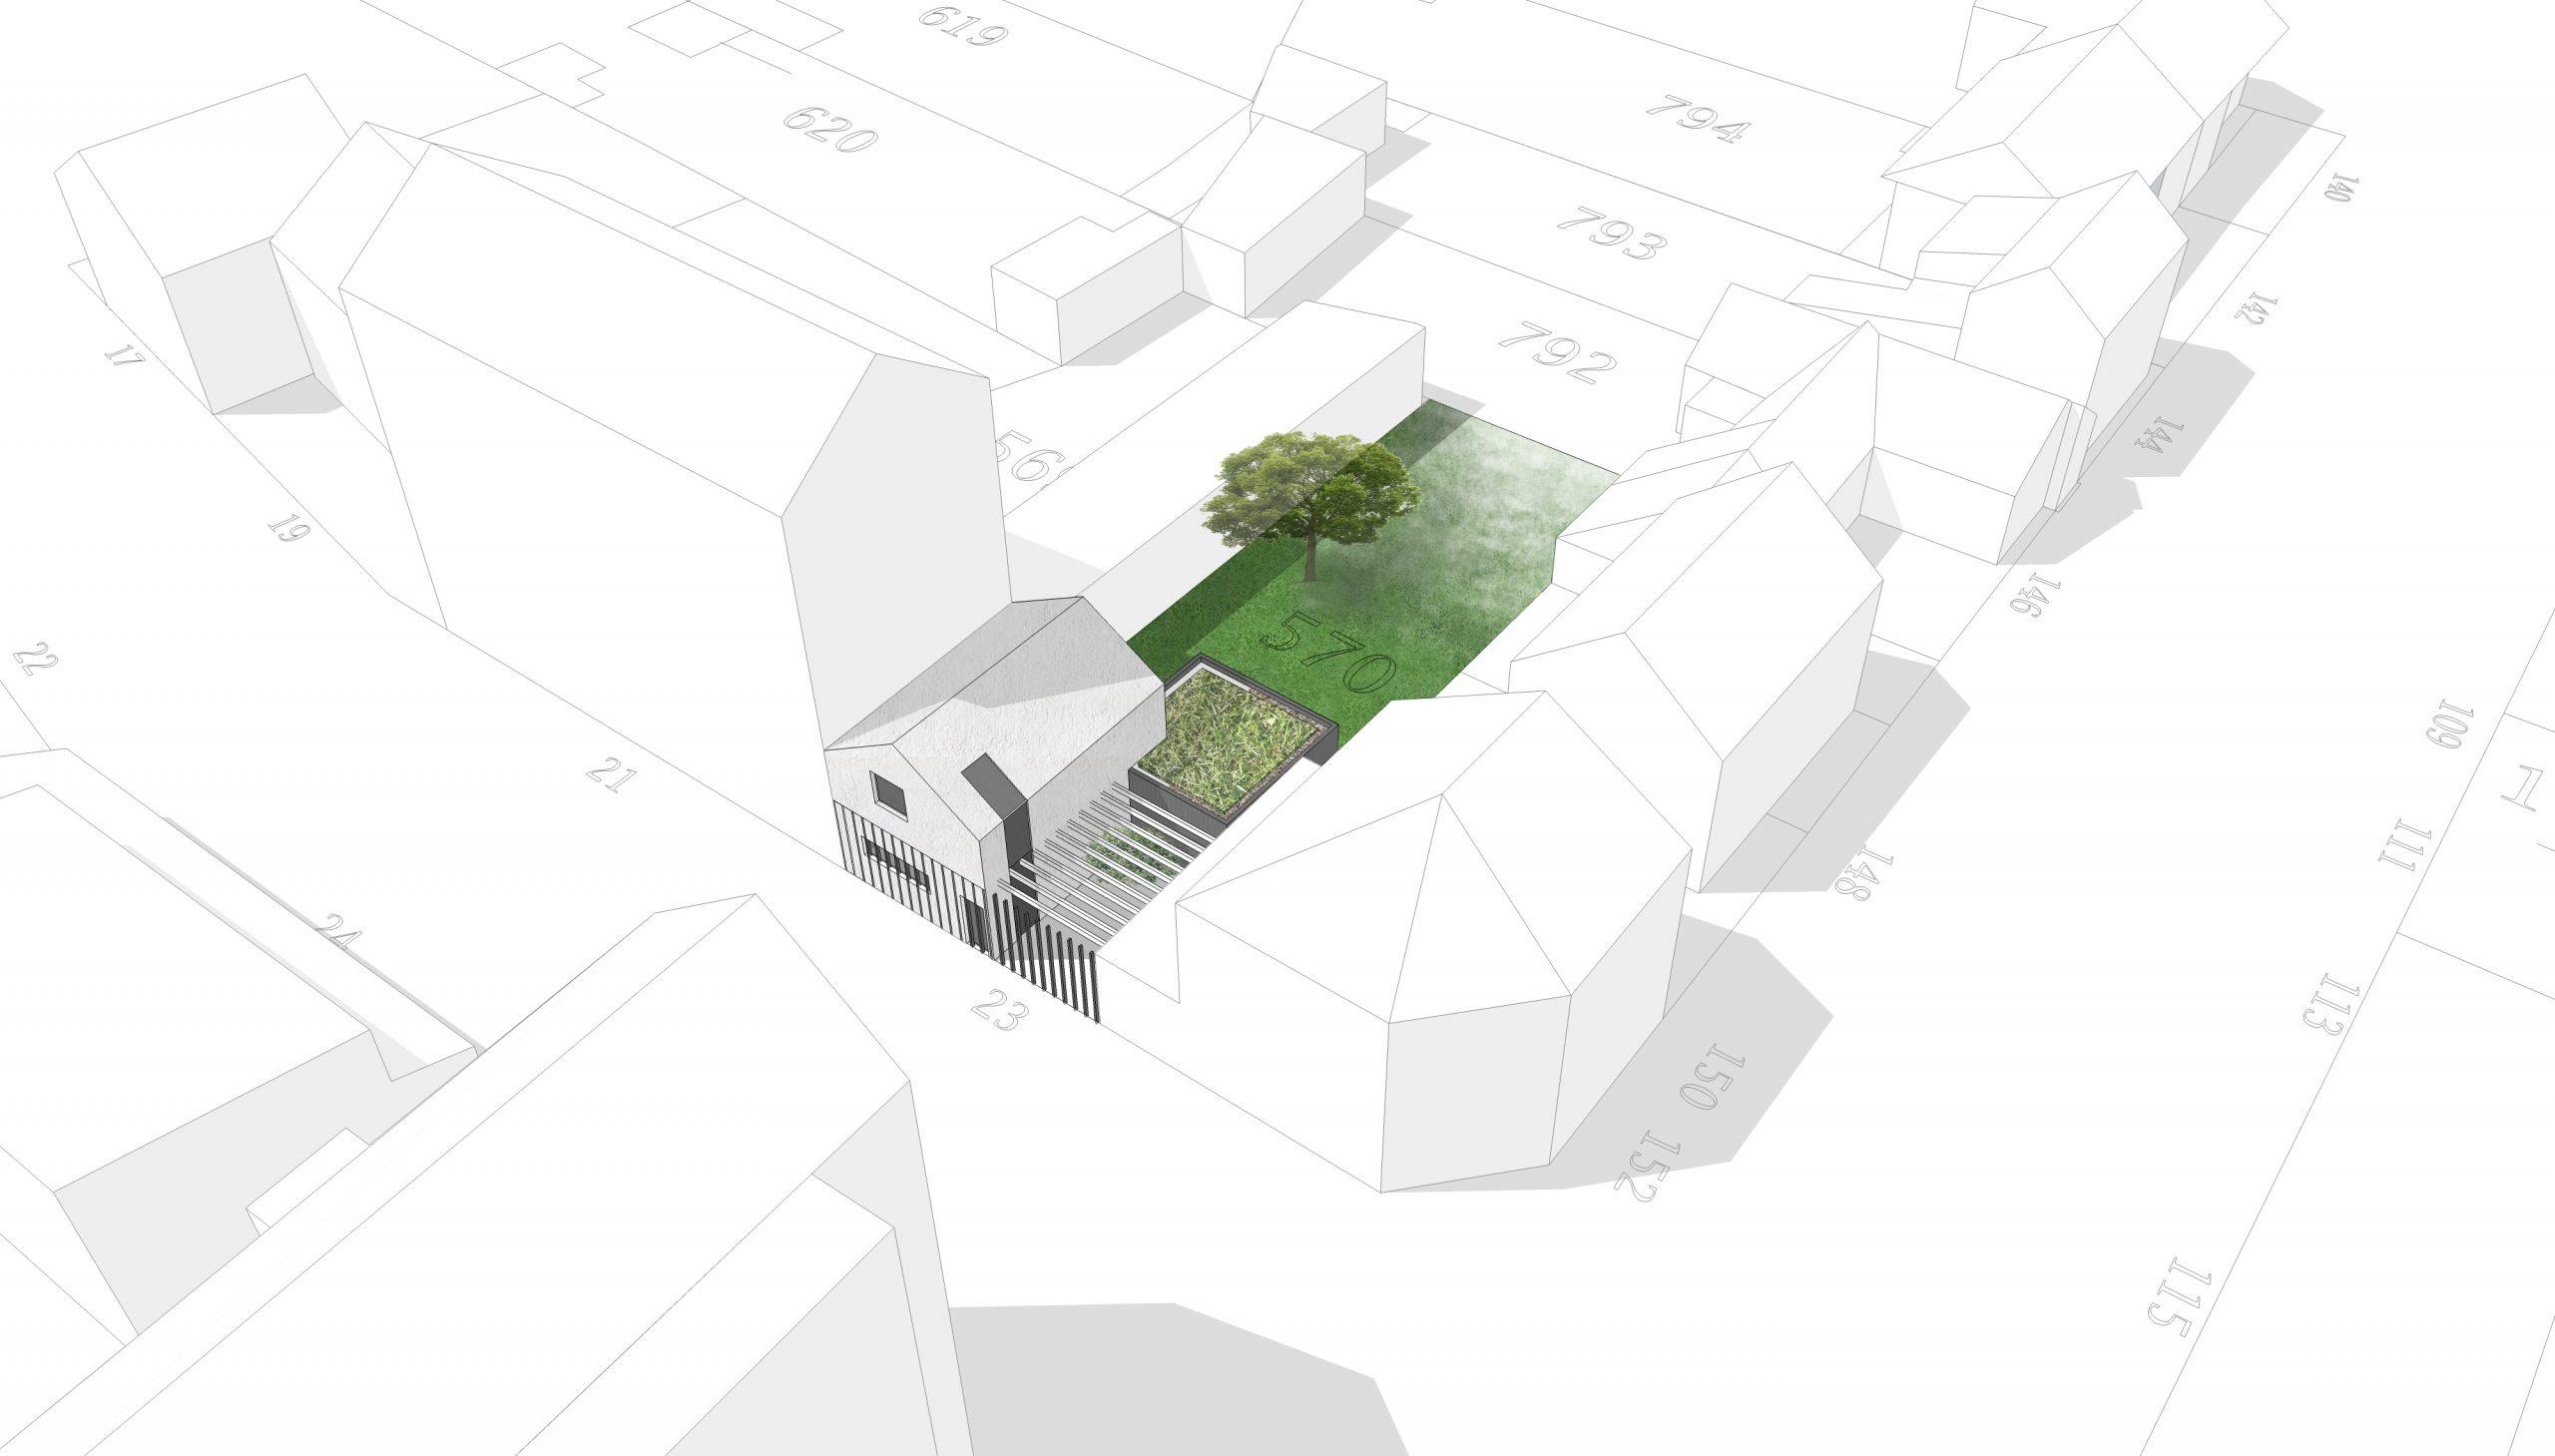 insideout-075-maison-construction-01_low_resized